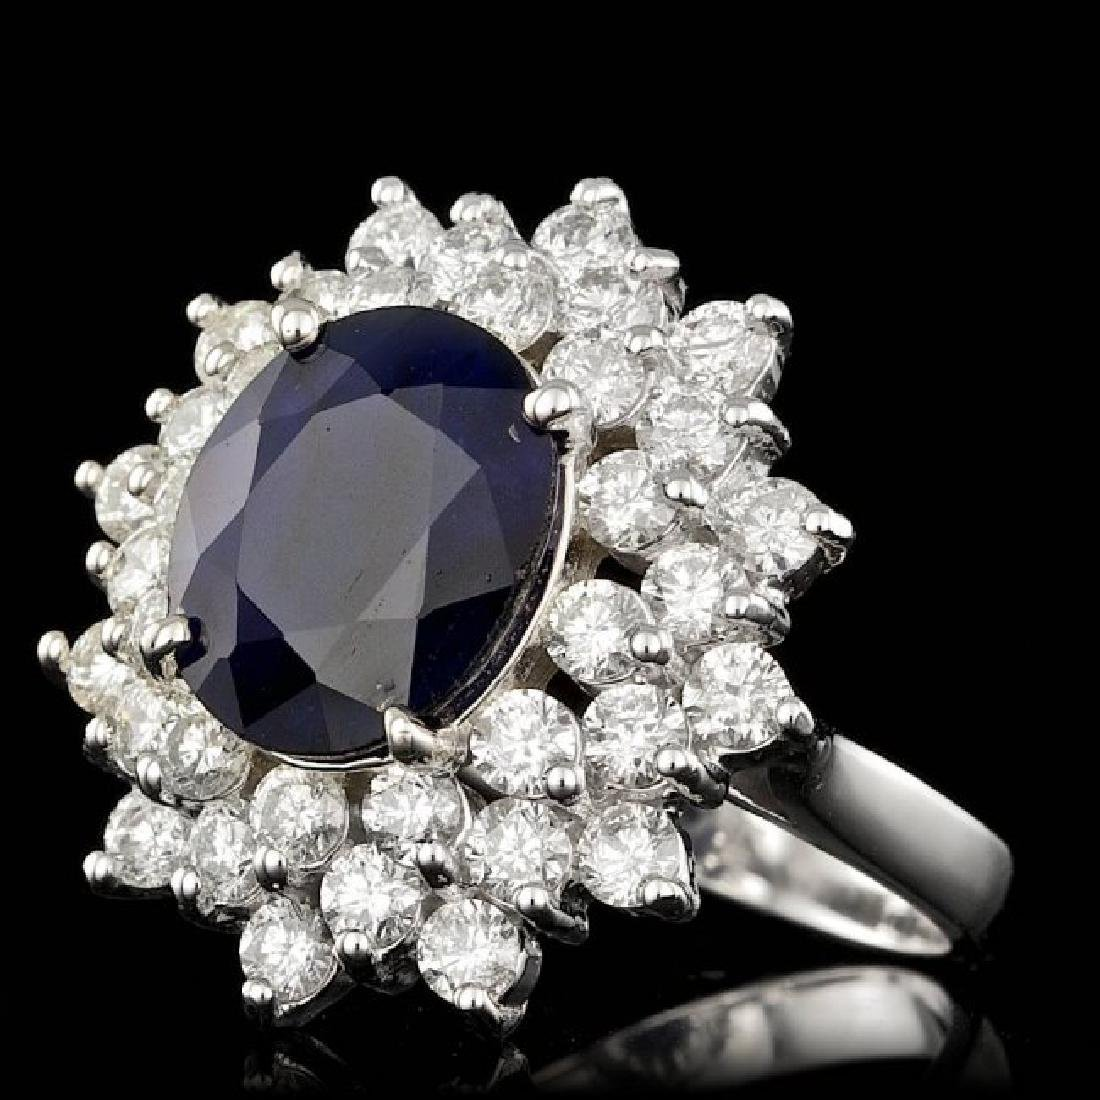 14k Gold 4.00ct Sapphire 2.00ct Diamond Ring - 2